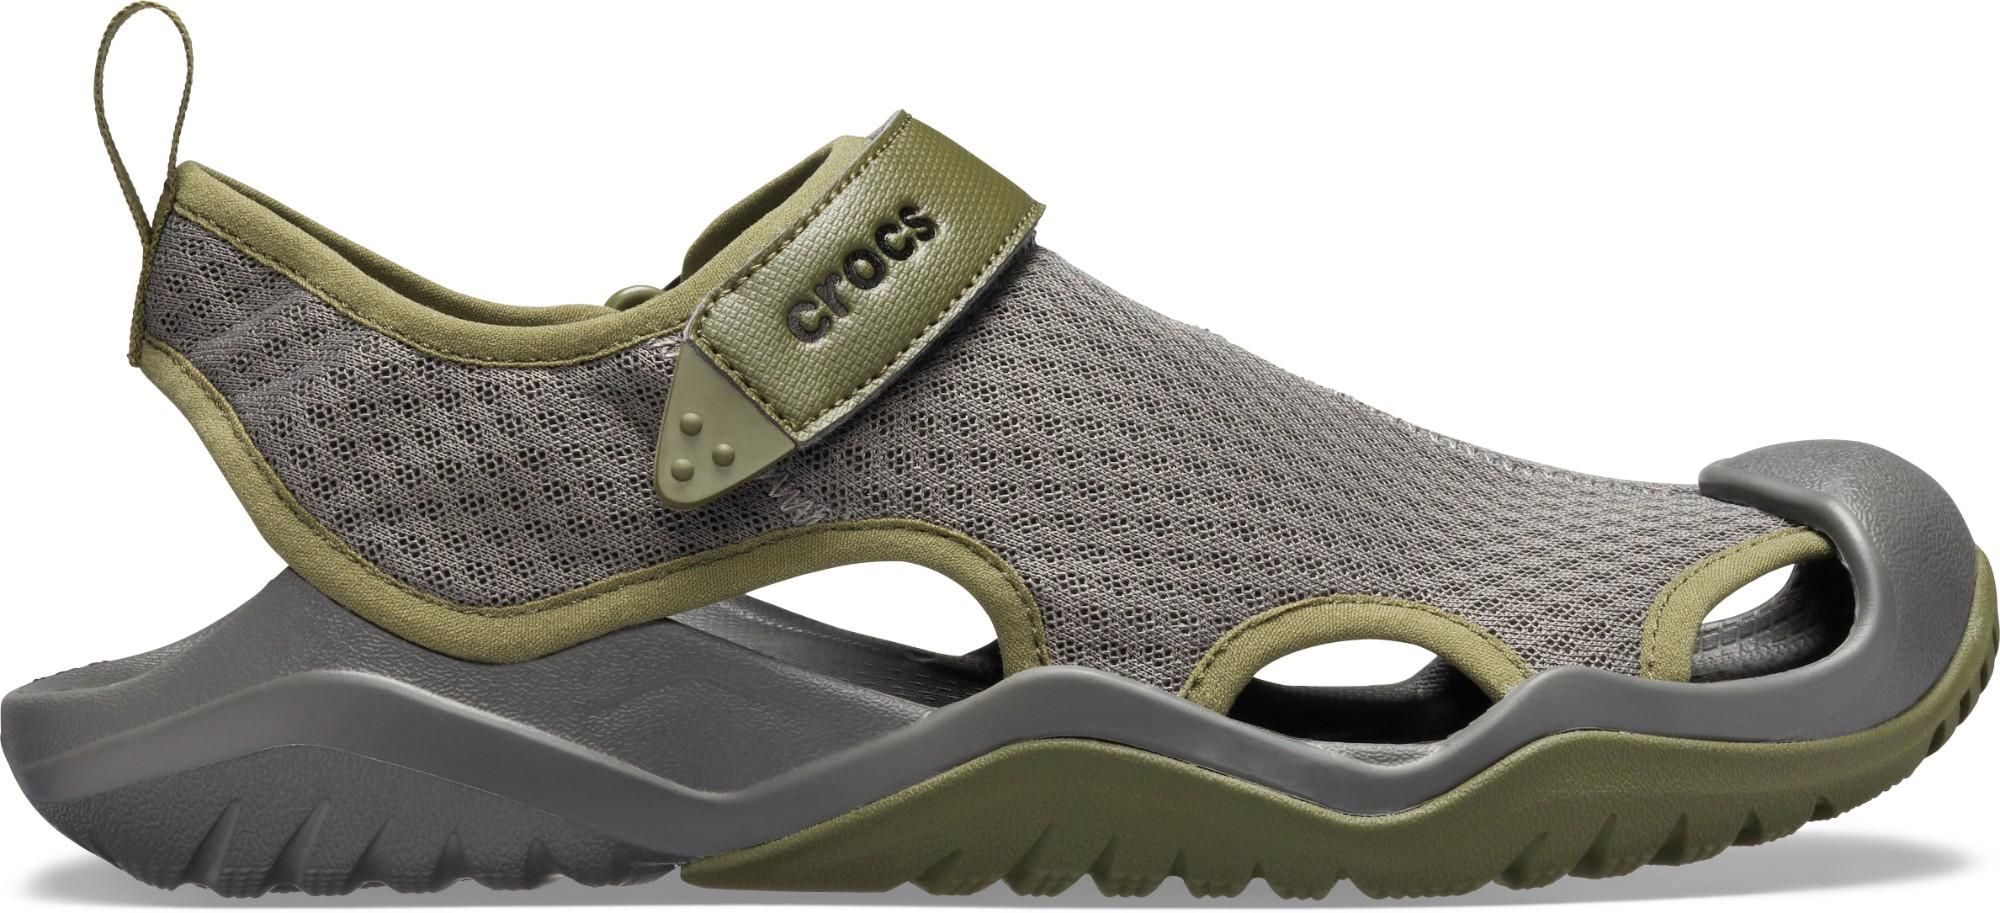 Crocs™ Swiftwater Mesh Deck Sandal Men's Slate Grey 42,5